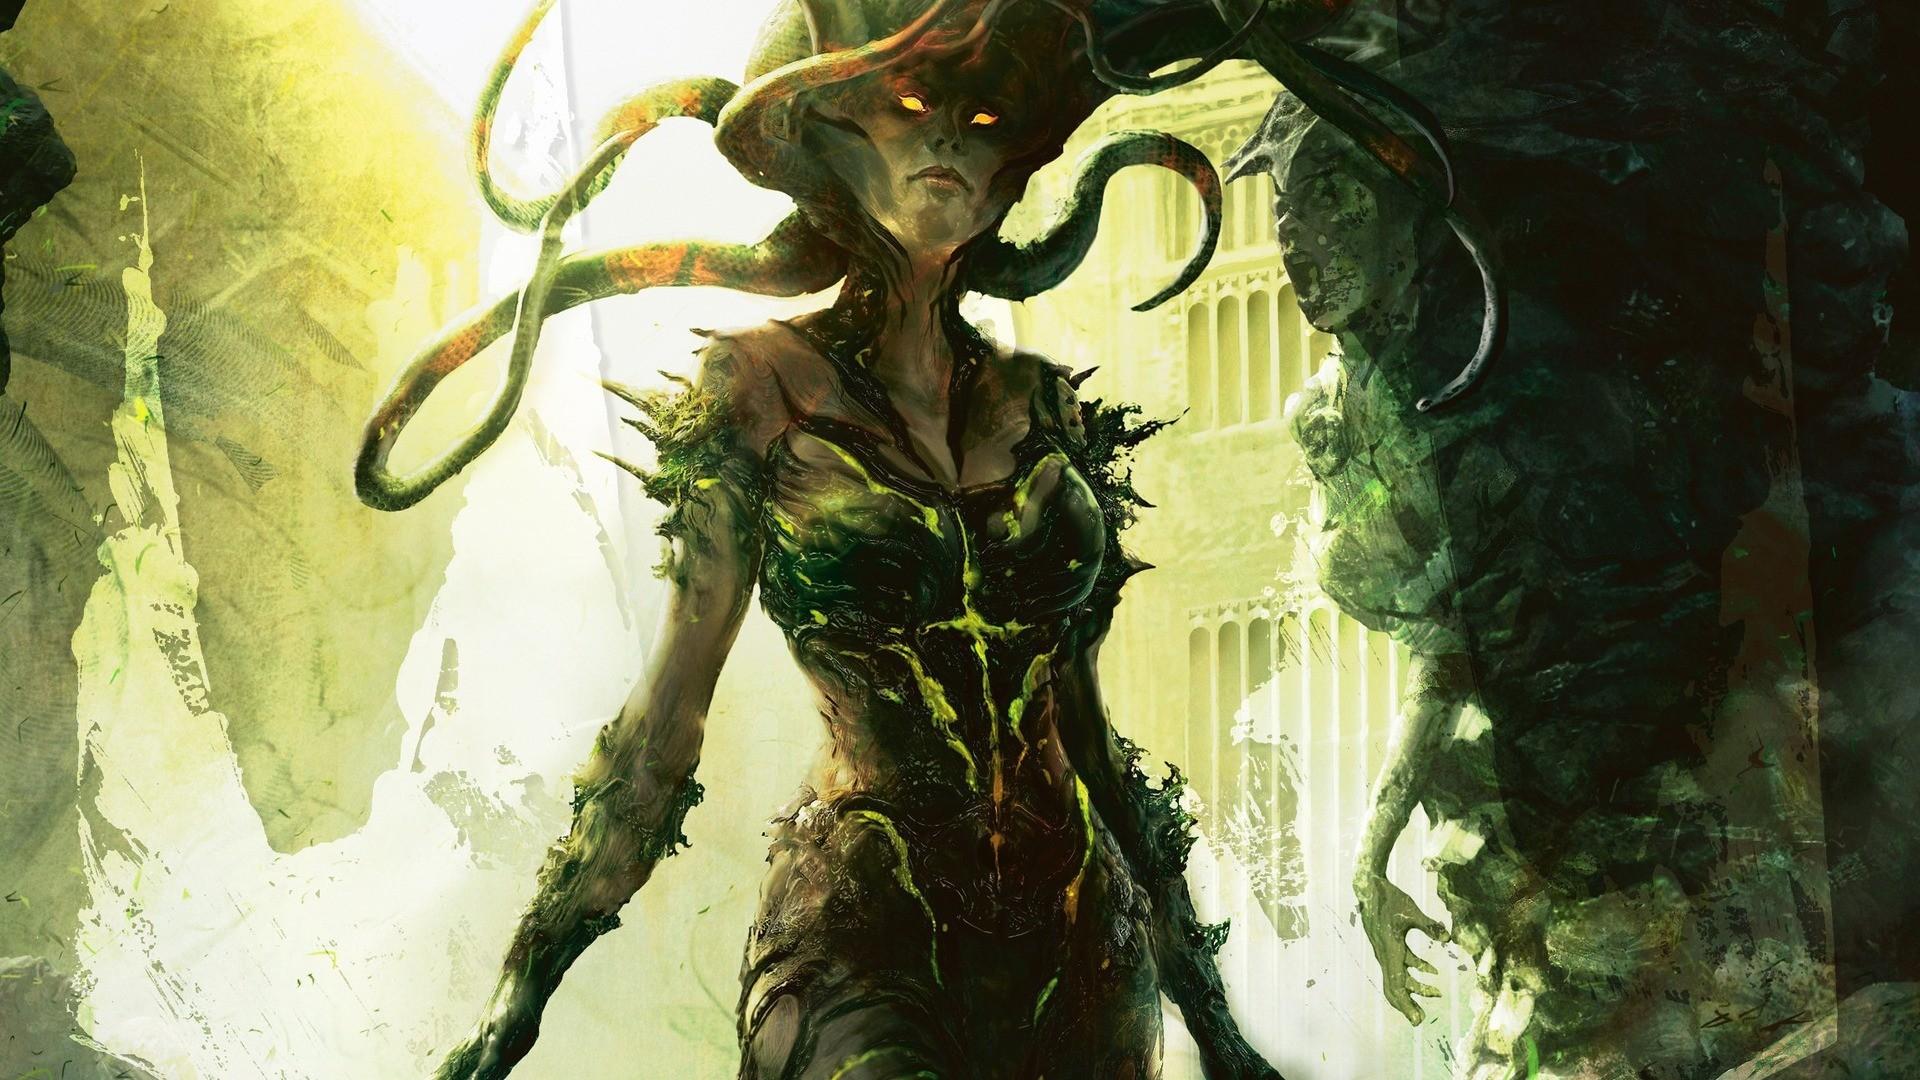 Res: 1920x1080, artwork fantasy art magic the gathering vraska